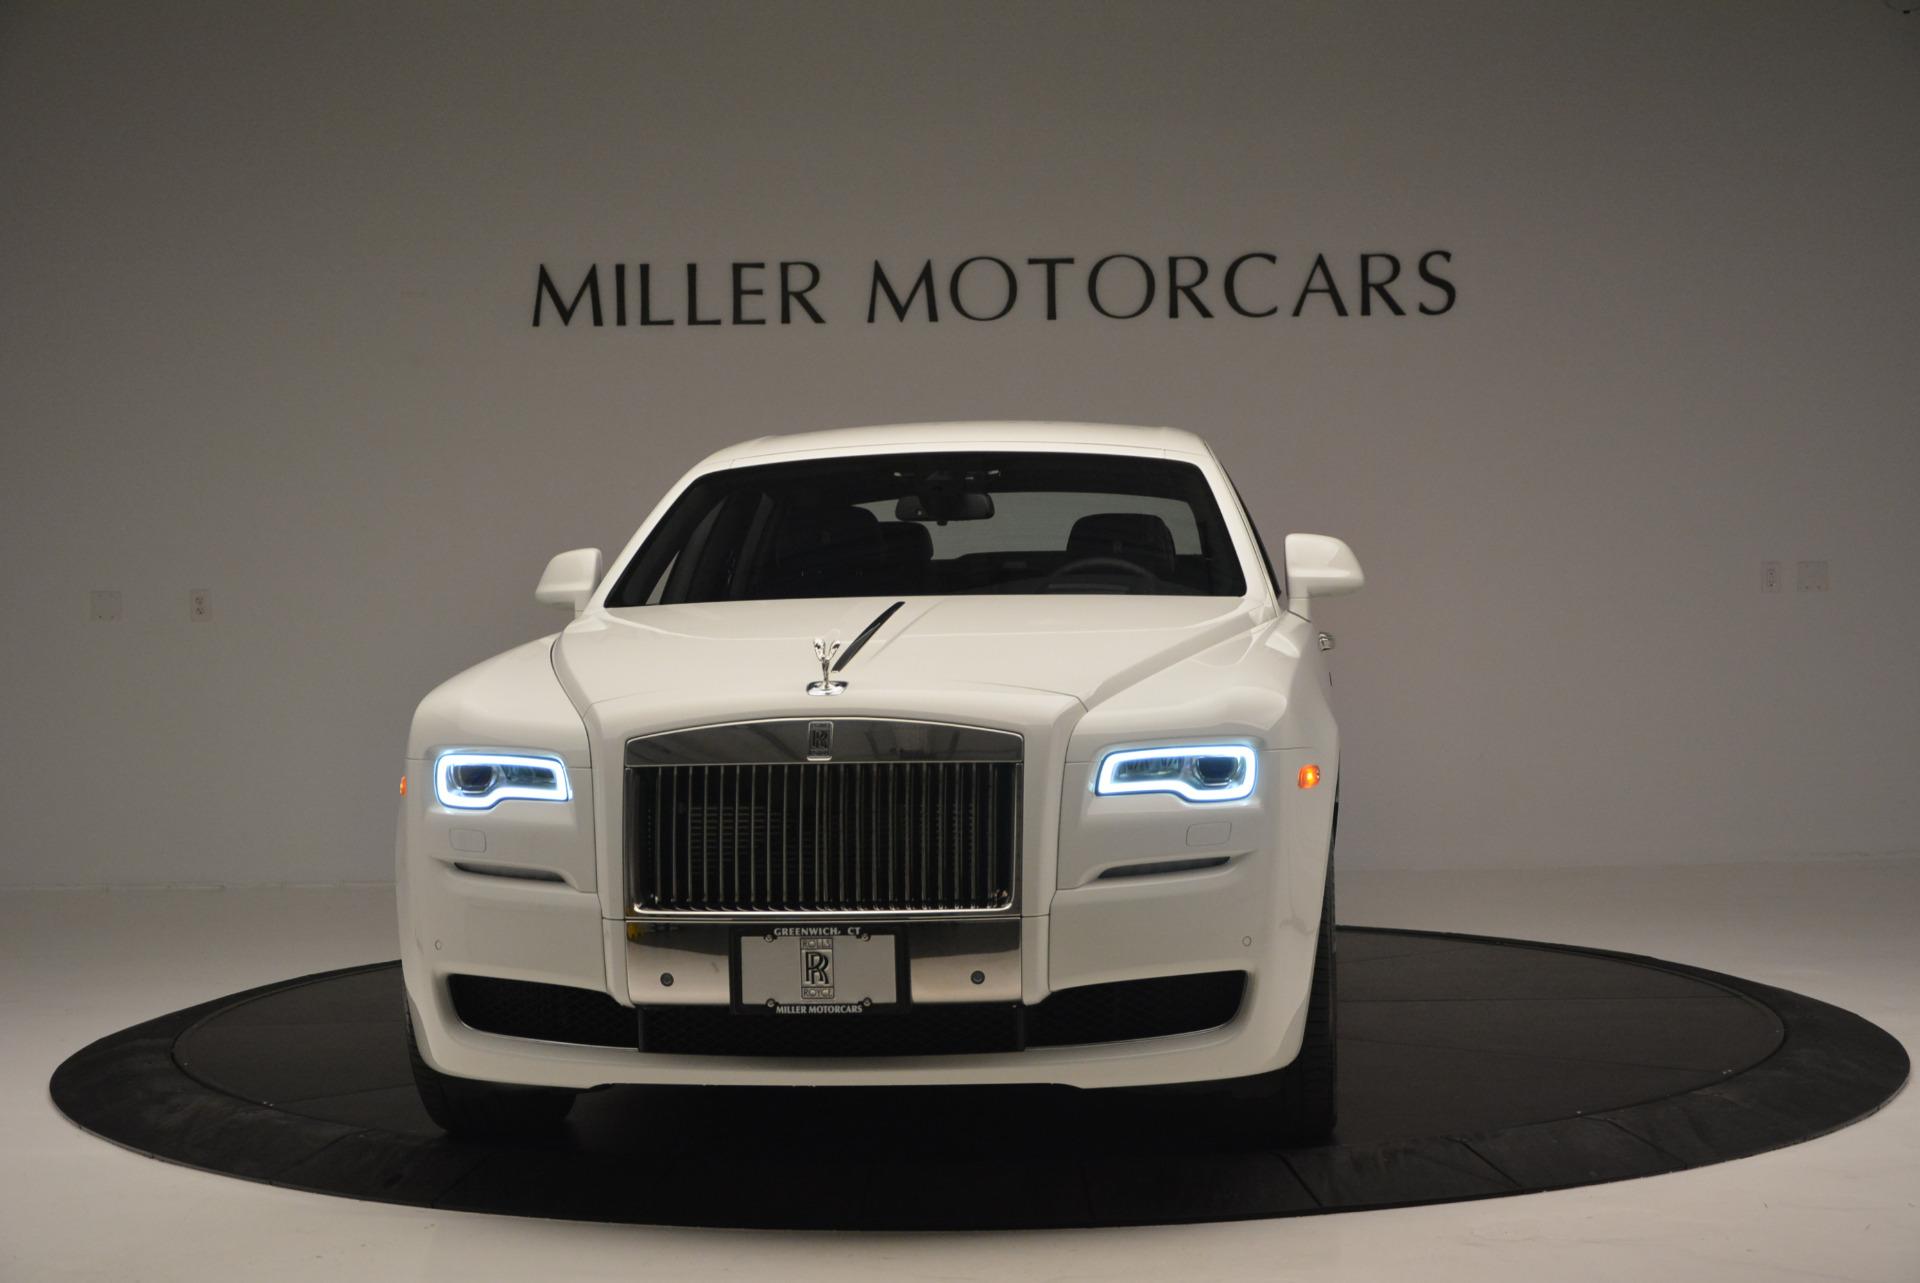 Used 2016 Rolls-Royce Ghost Series II for sale Sold at Rolls-Royce Motor Cars Greenwich in Greenwich CT 06830 1